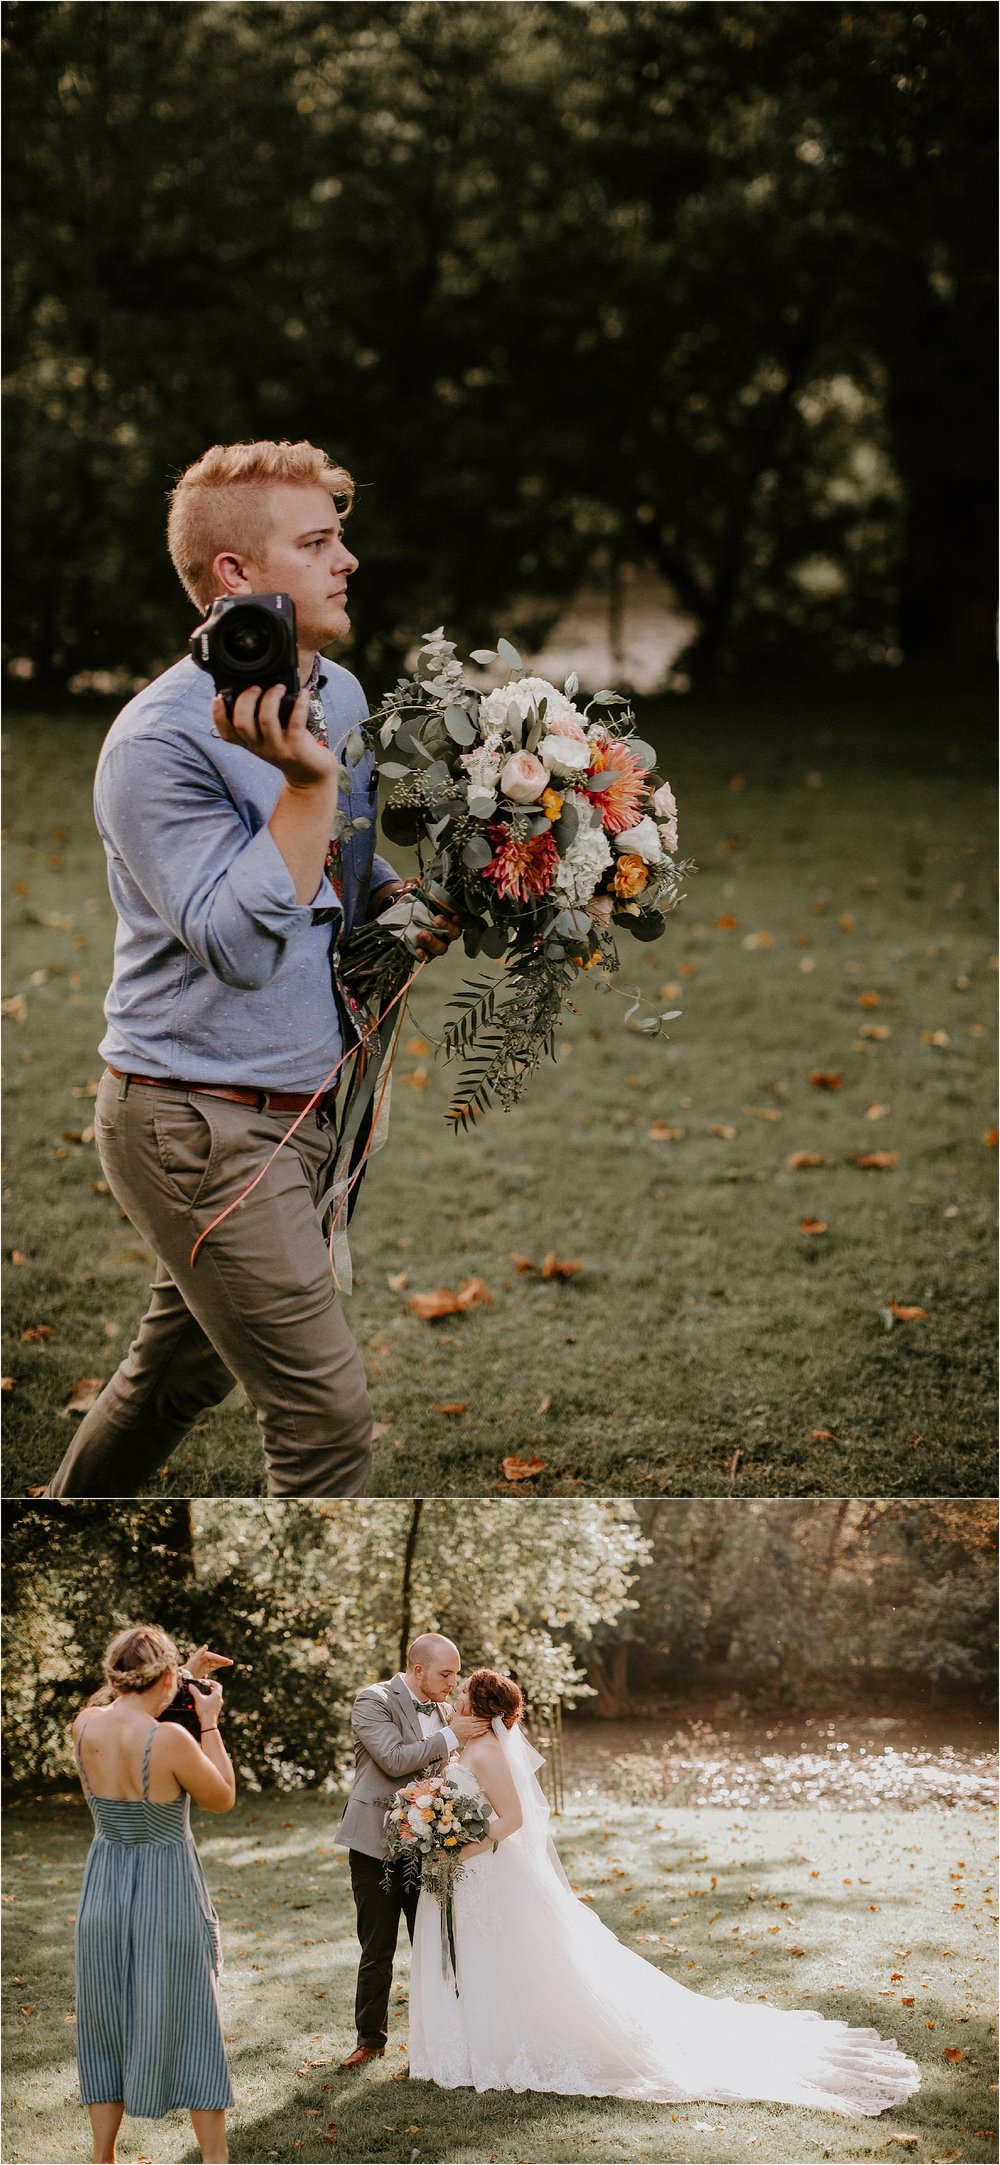 Sarah_Brookhart_PA_MD_Wedding_Photographer_0022.jpg